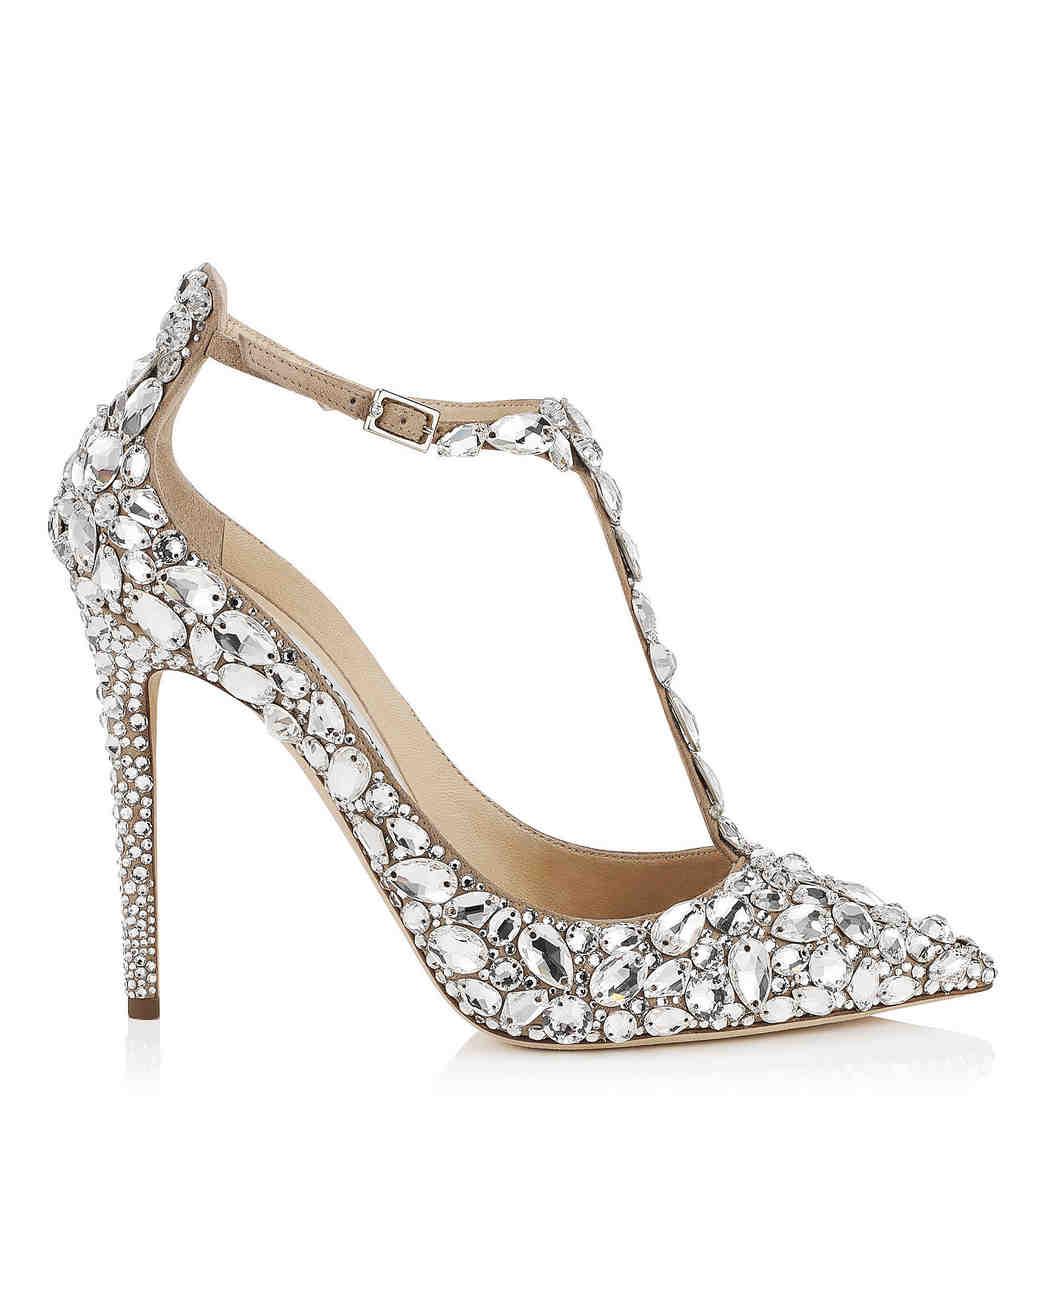 closed toe wedding shoes winter jimmy choo wedding shoes Crystal Covered Wedding Shoes Jimmy Choo